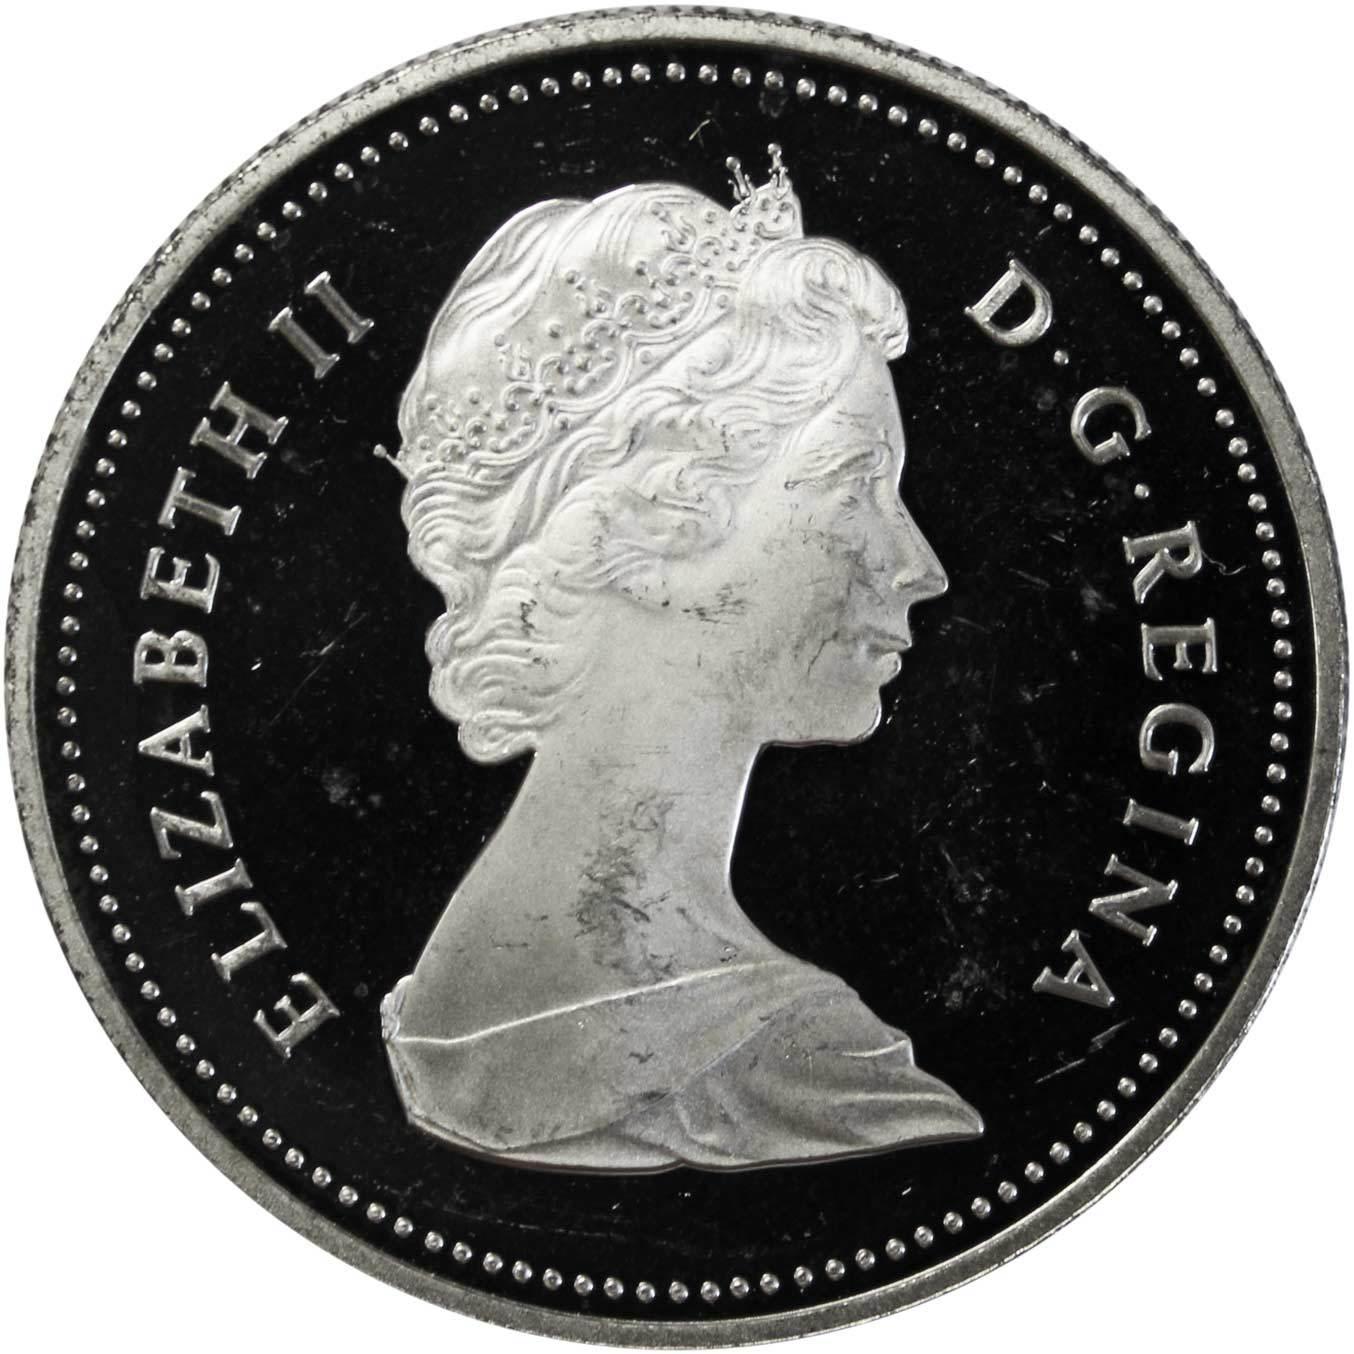 1 доллар. 150 лет городу Торонто. Канада. 1984 г. PROOF Серебро